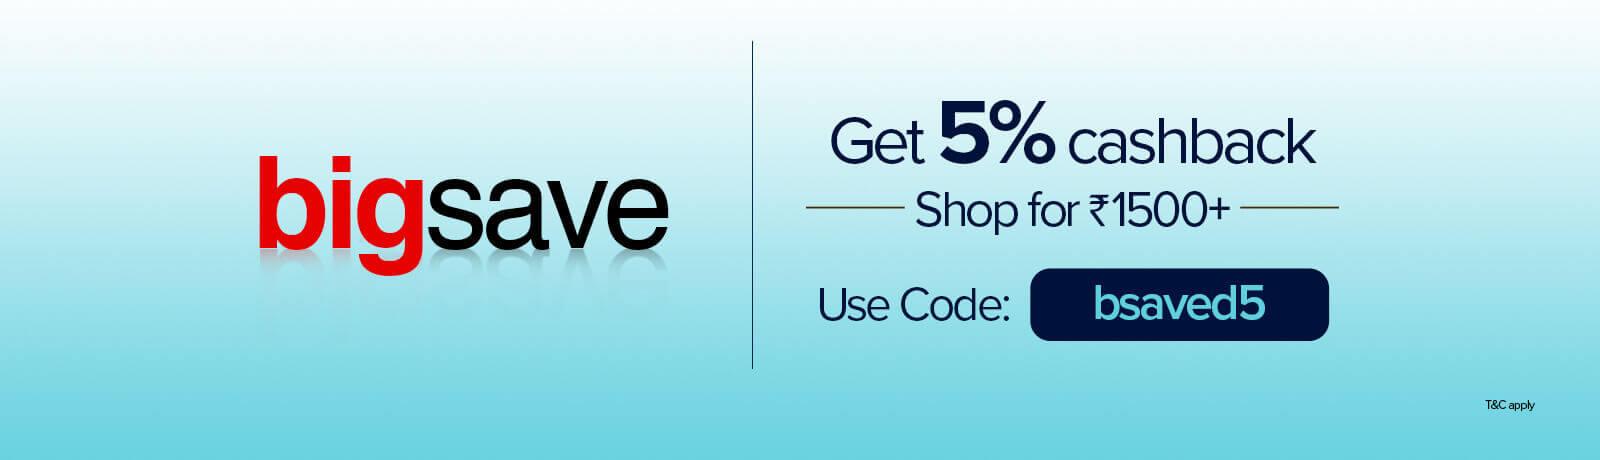 Big save offers